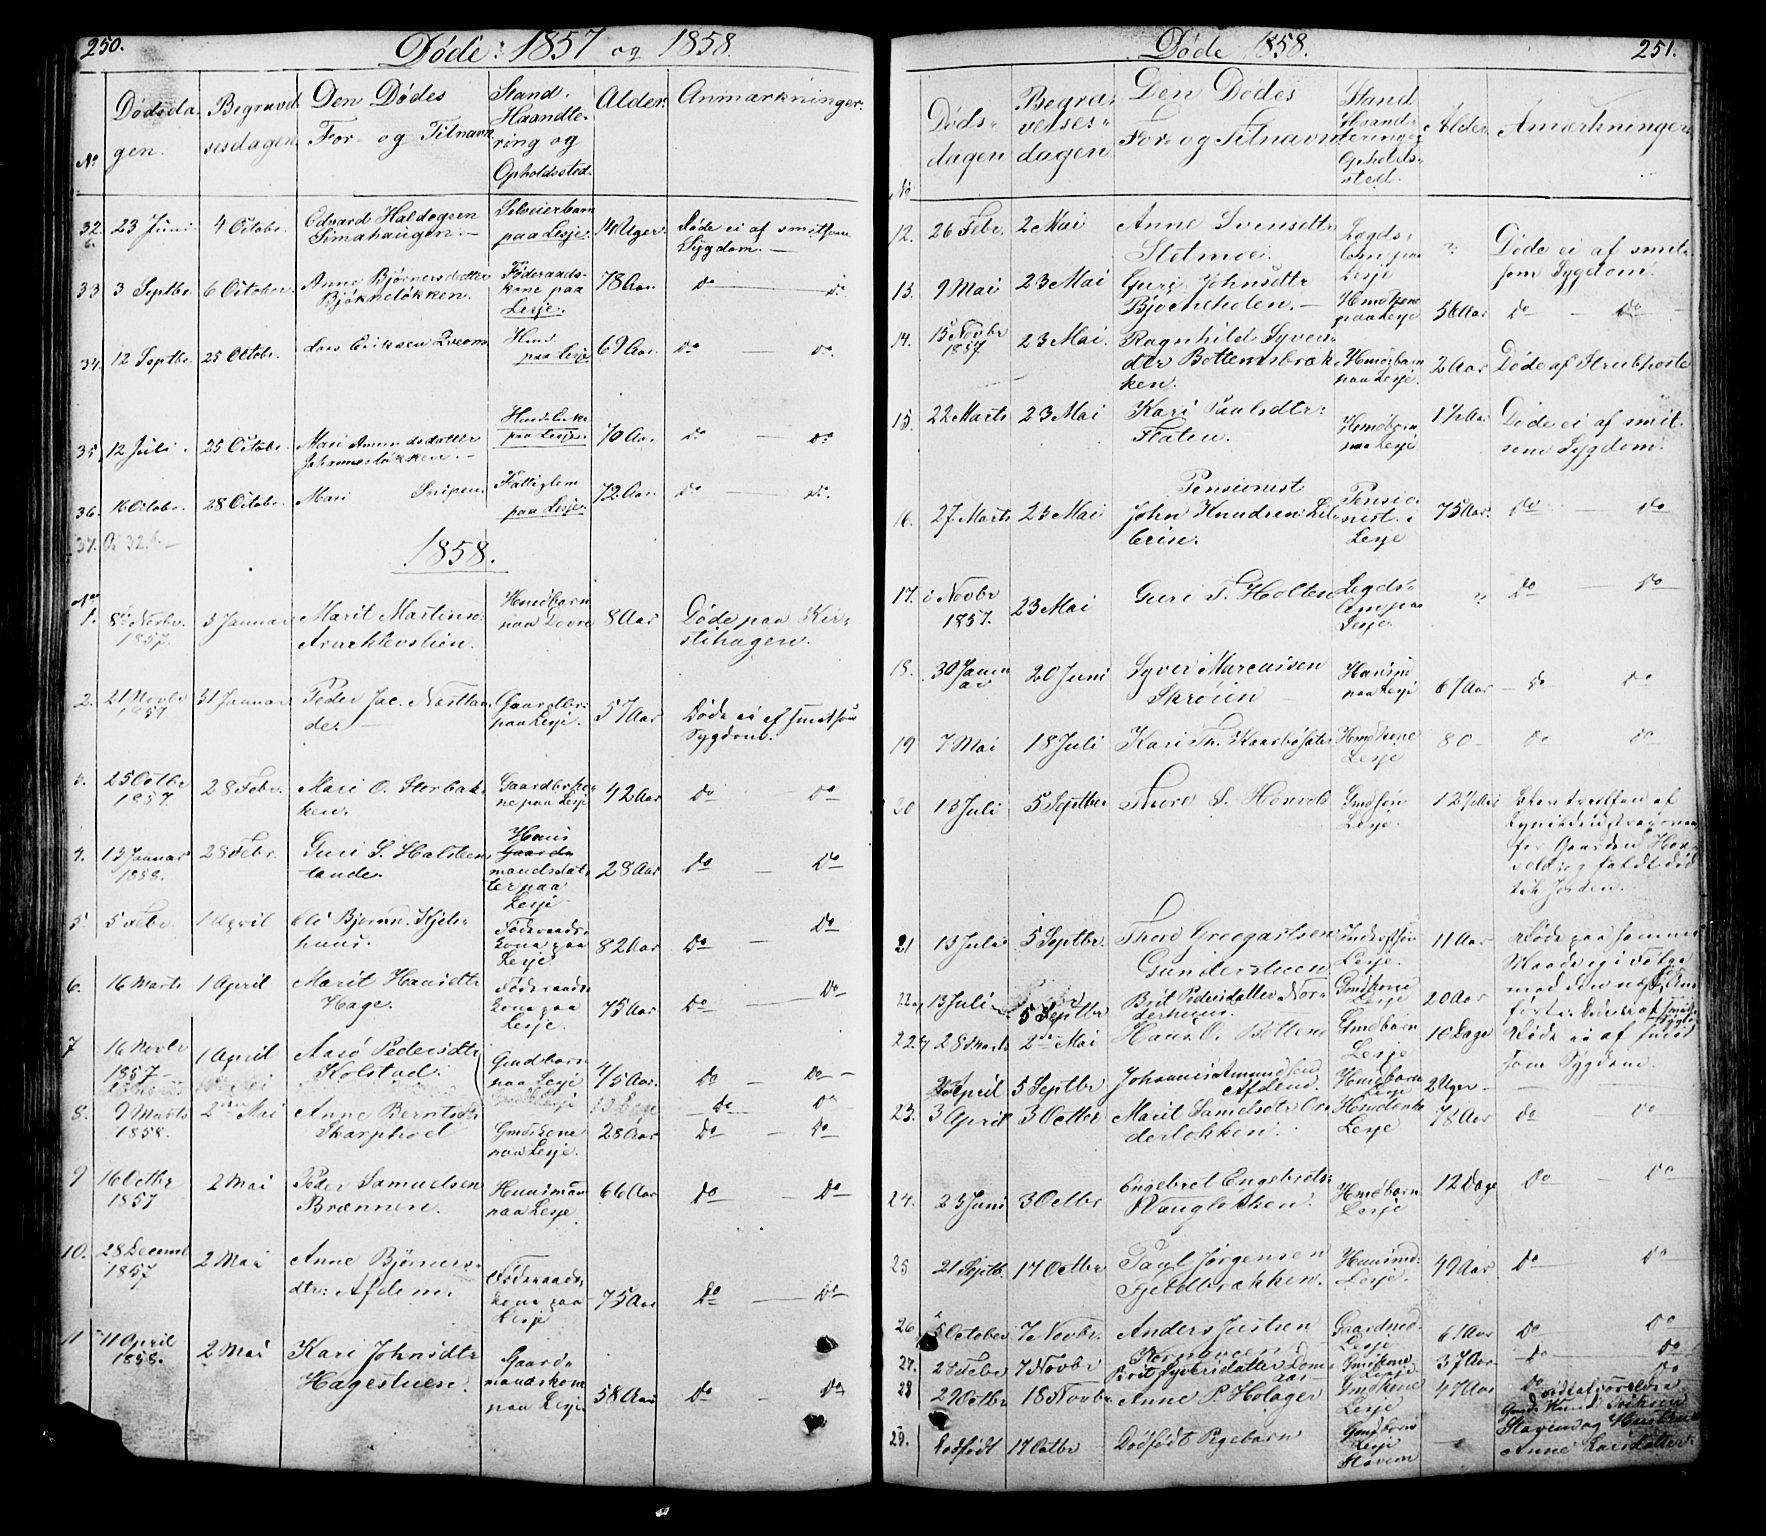 SAH, Lesja prestekontor, Klokkerbok nr. 5, 1850-1894, s. 250-251